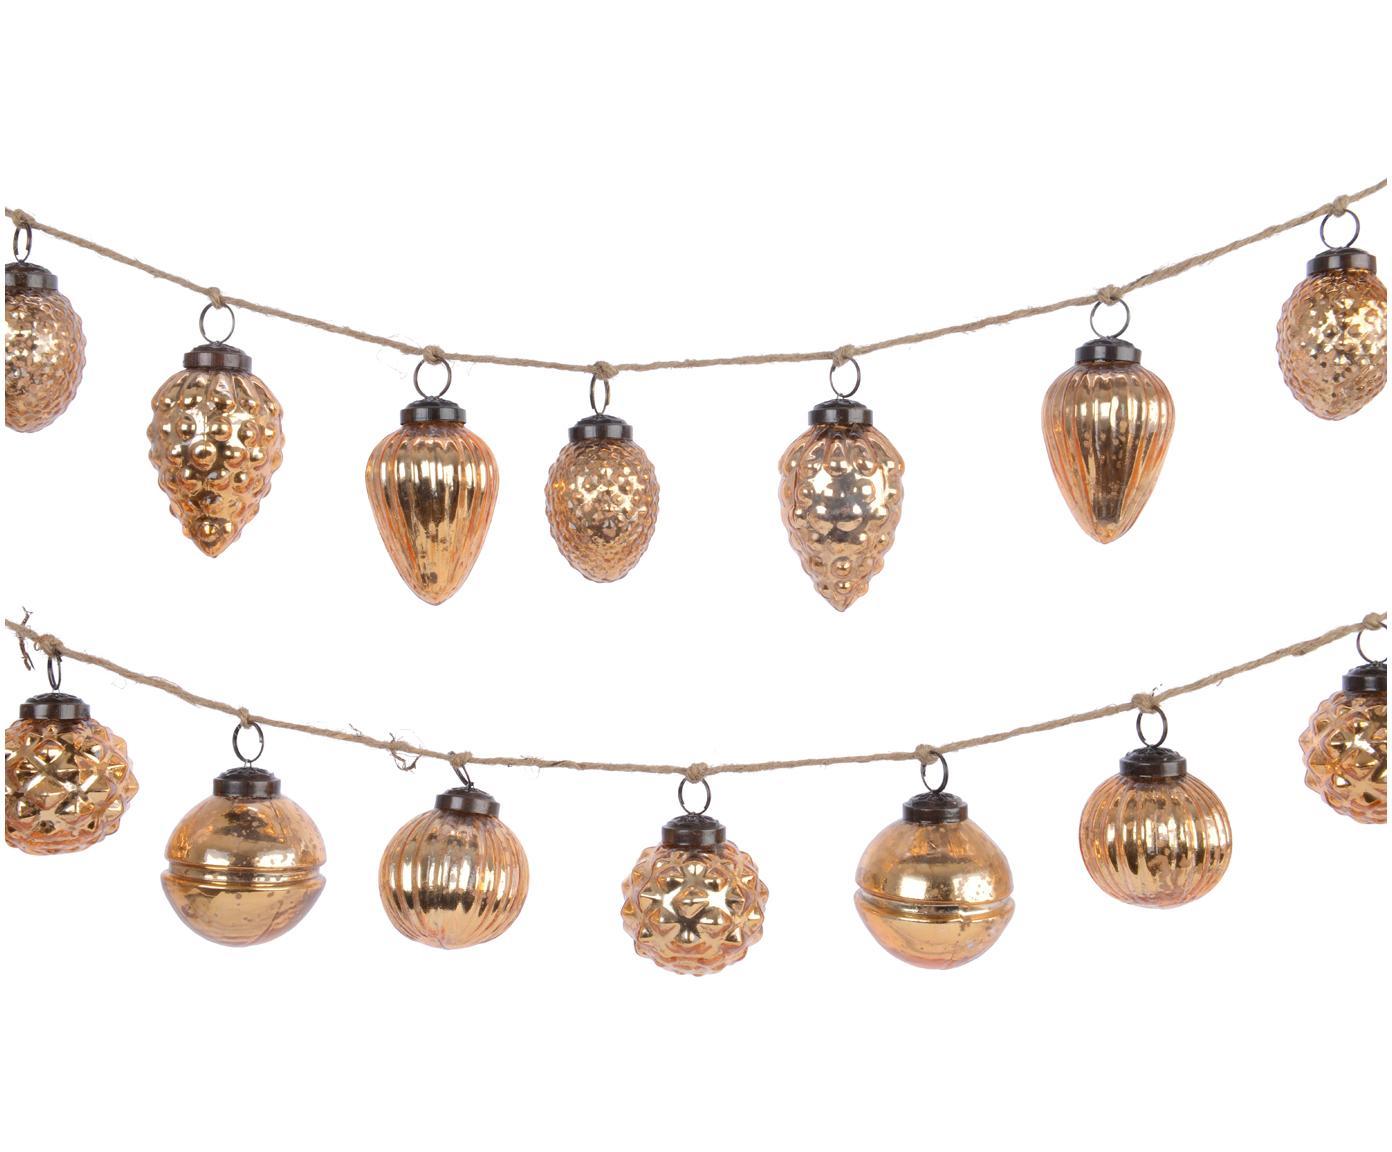 Set de guirnaldas navideñas Dil, 2pzas., Vaso, Dorado, L 120 cm